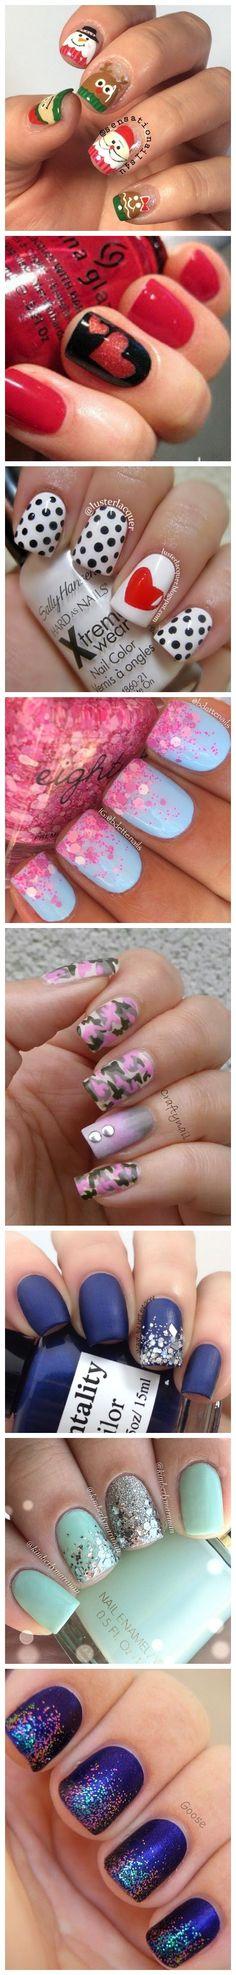 Nail Art Ideas and Designs http://hubz.info/58/cute-nail-art-design